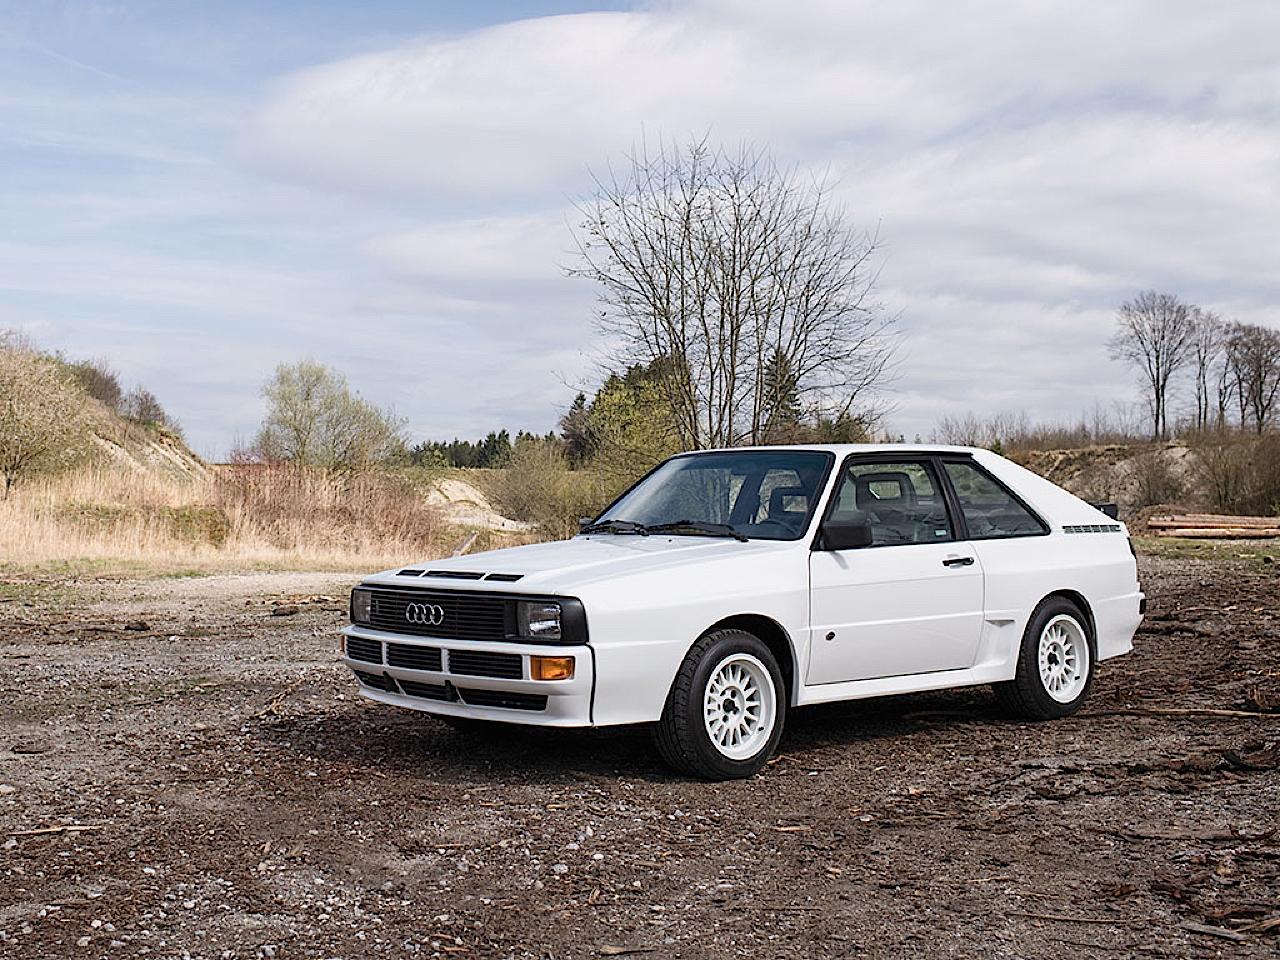 Audi Quattro Sport - Châssis court, turbo et muscu ! 12